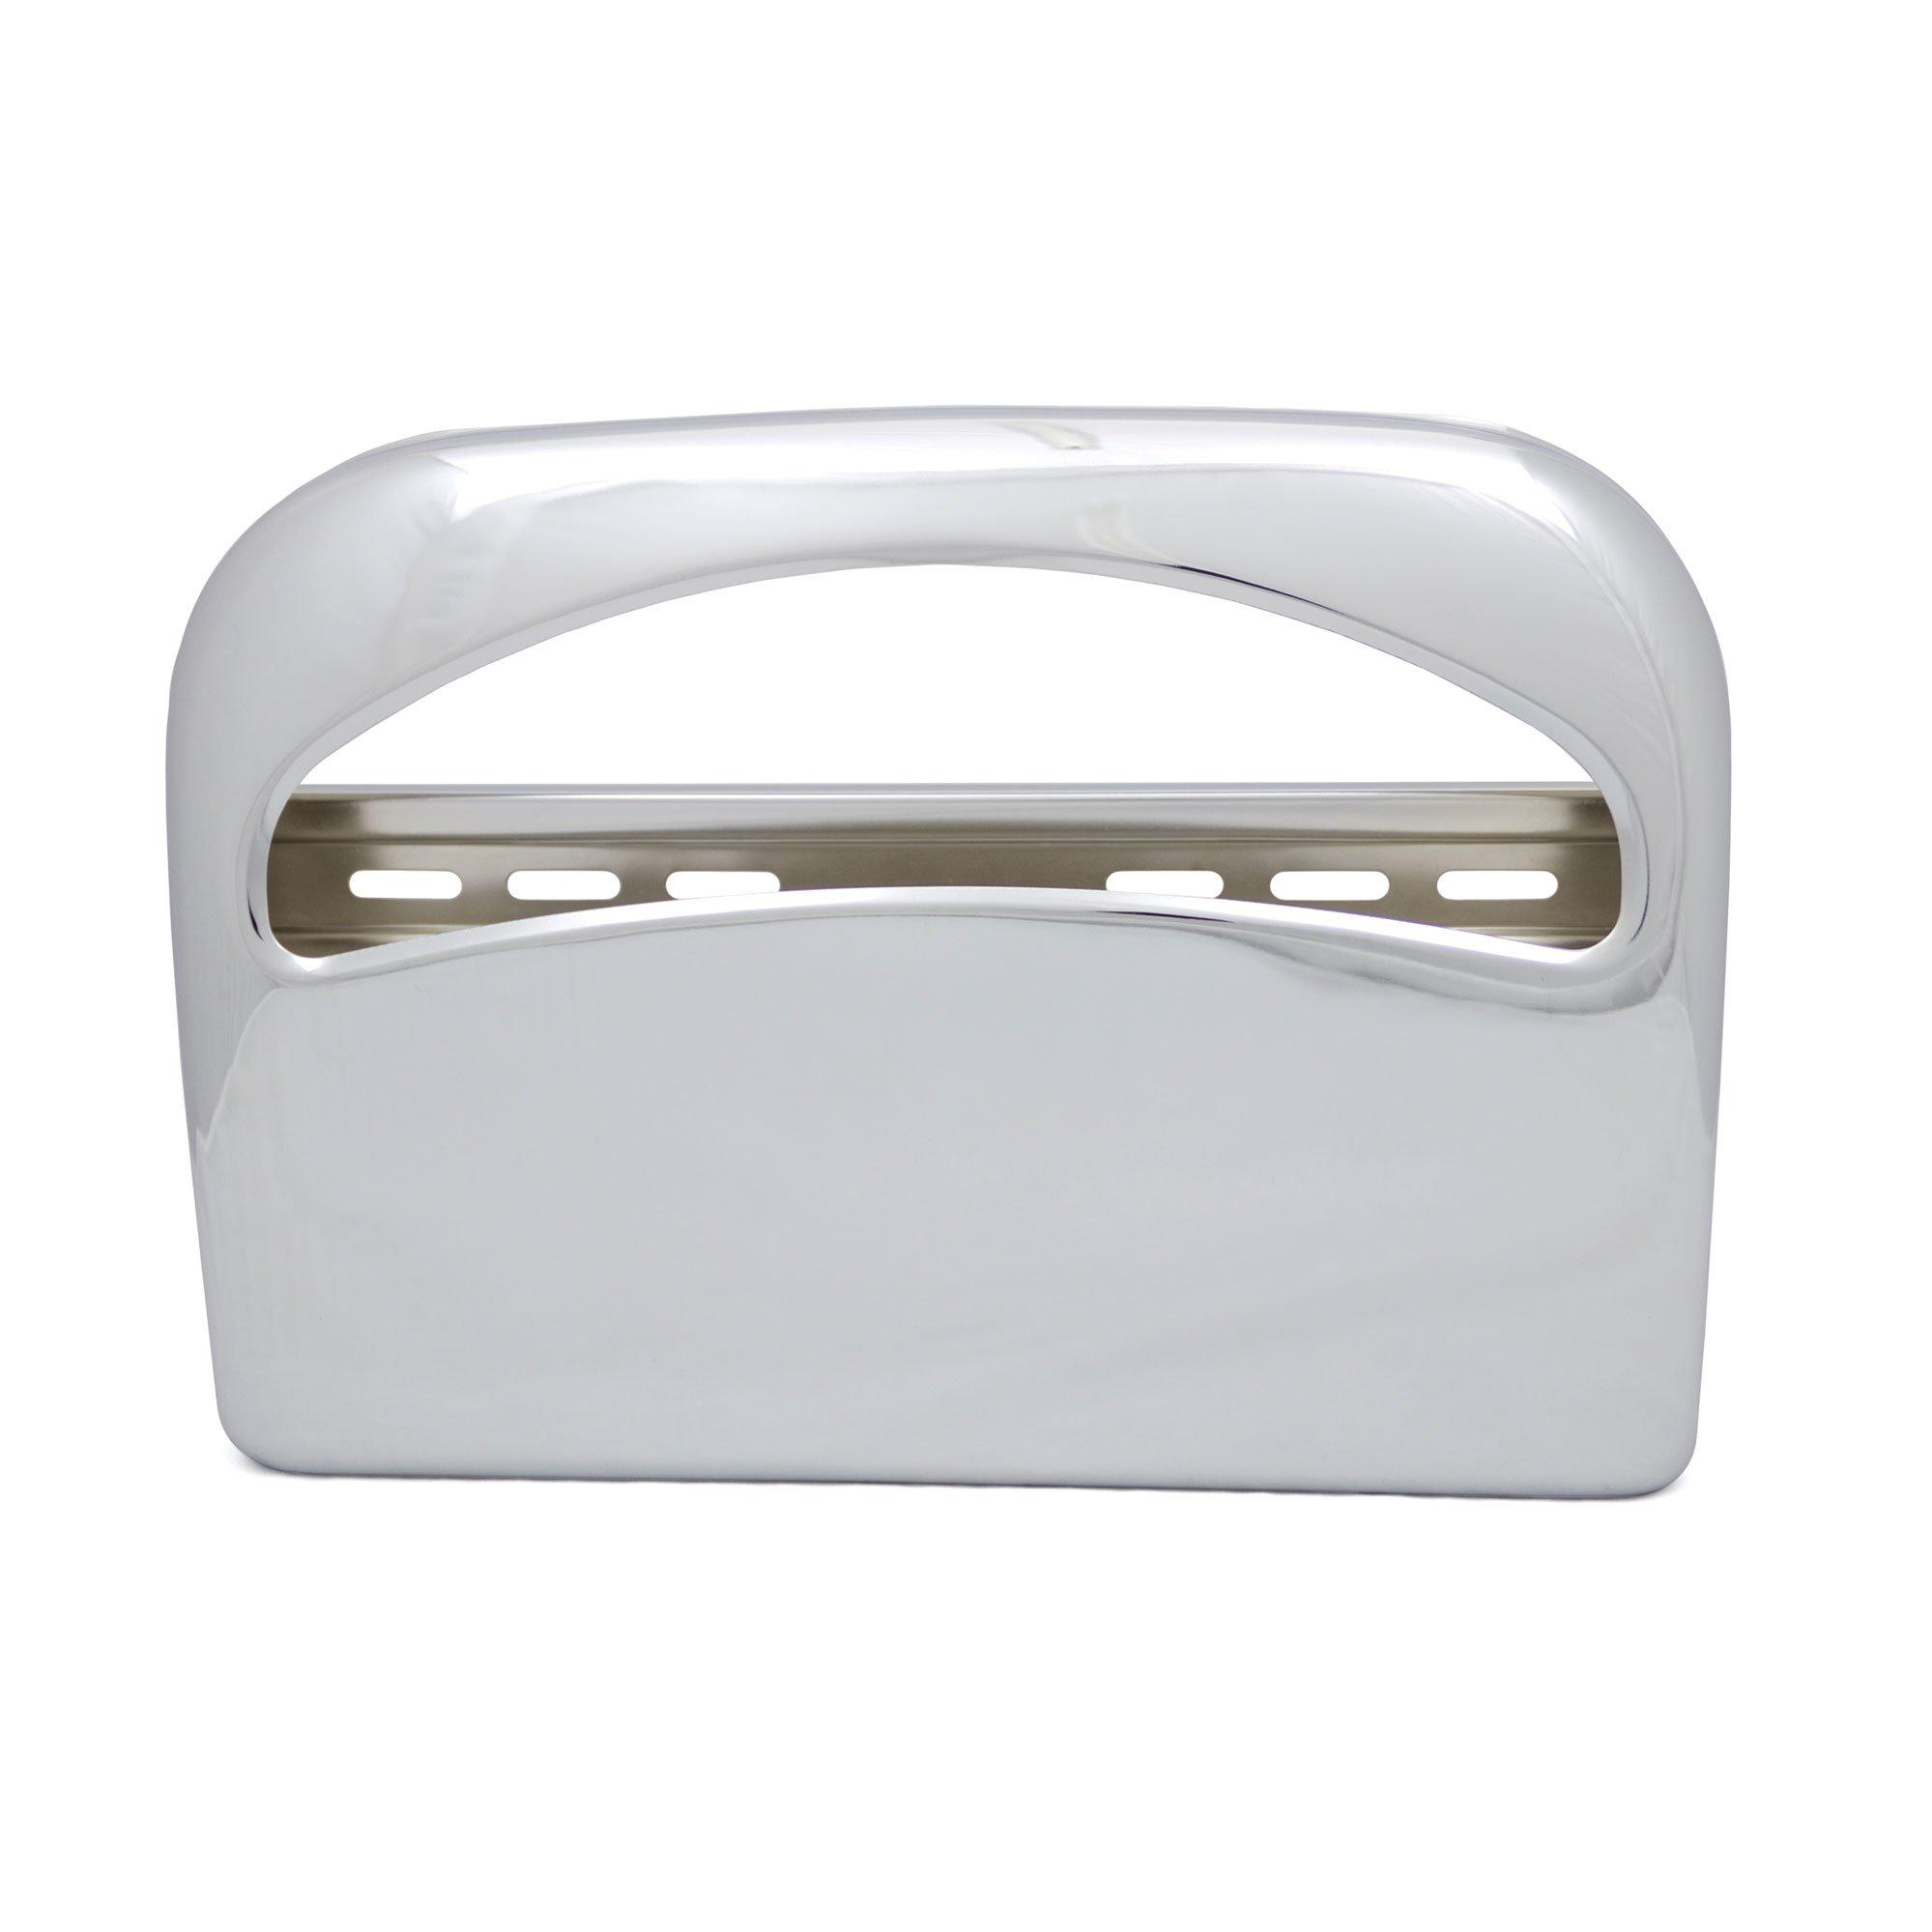 Toliet Seat Cover Dispenser, Metal, Round Corners, Chrome